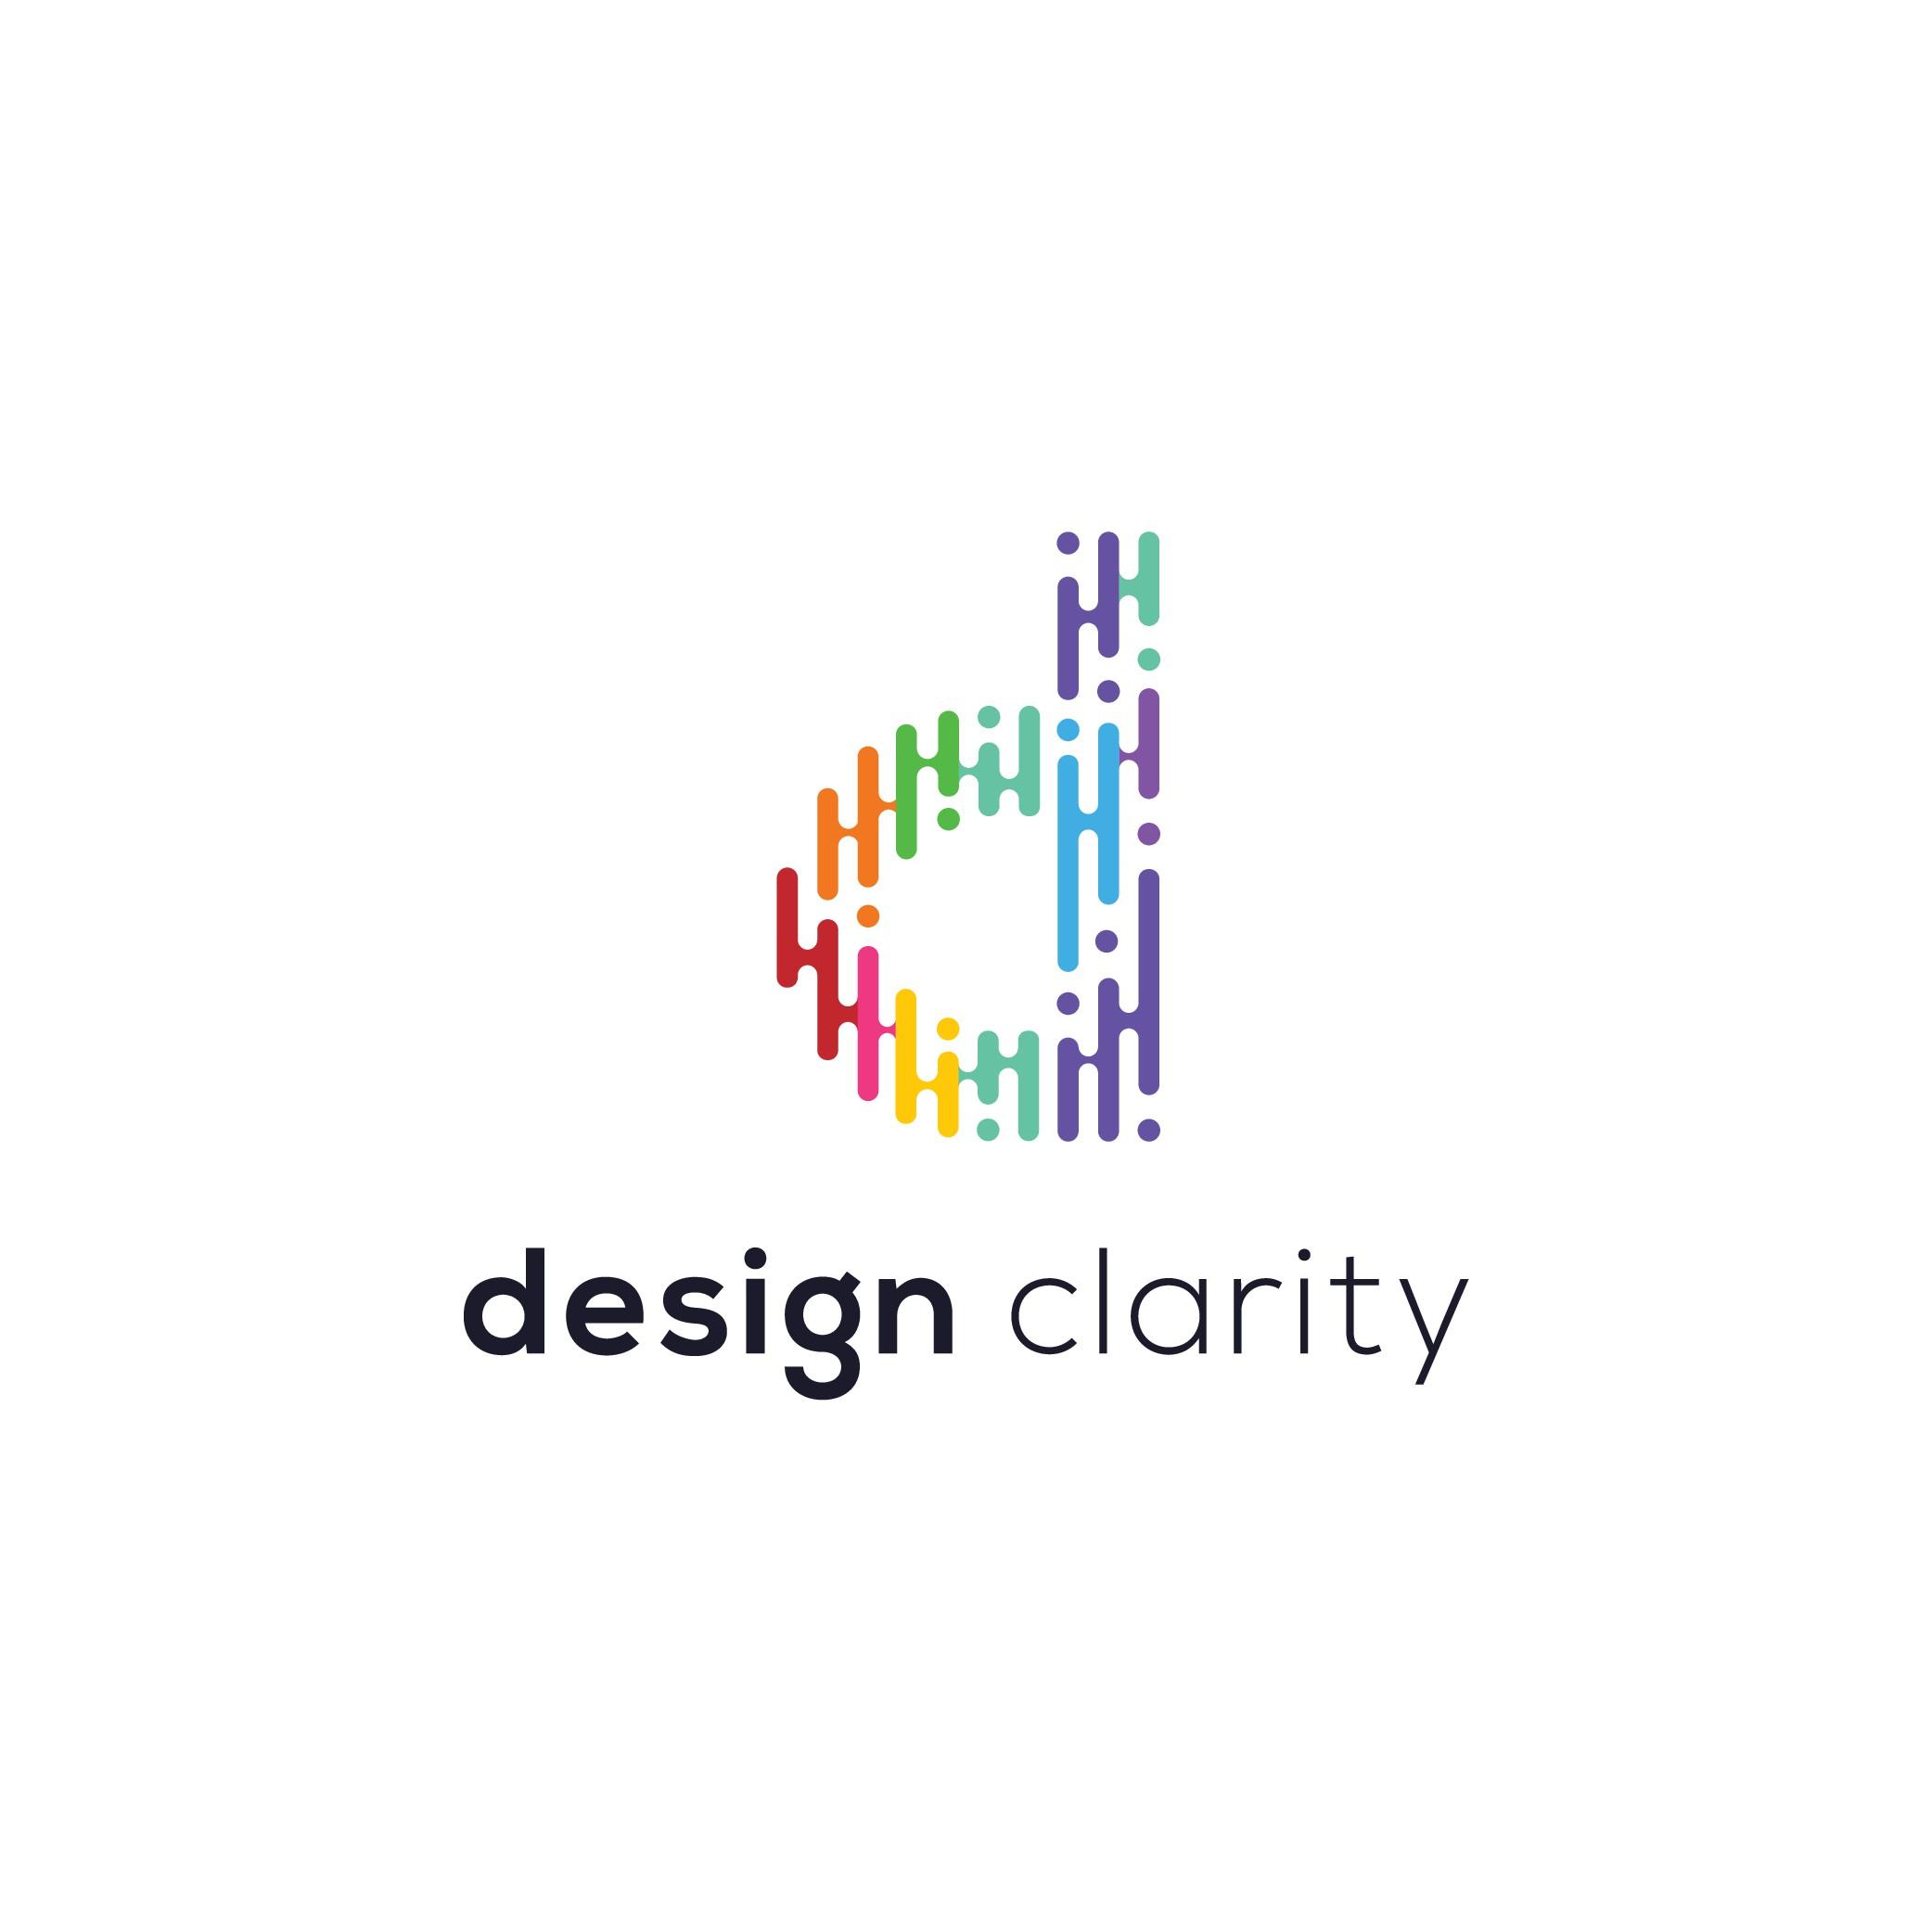 Design a powerful logo for a digital design education platform